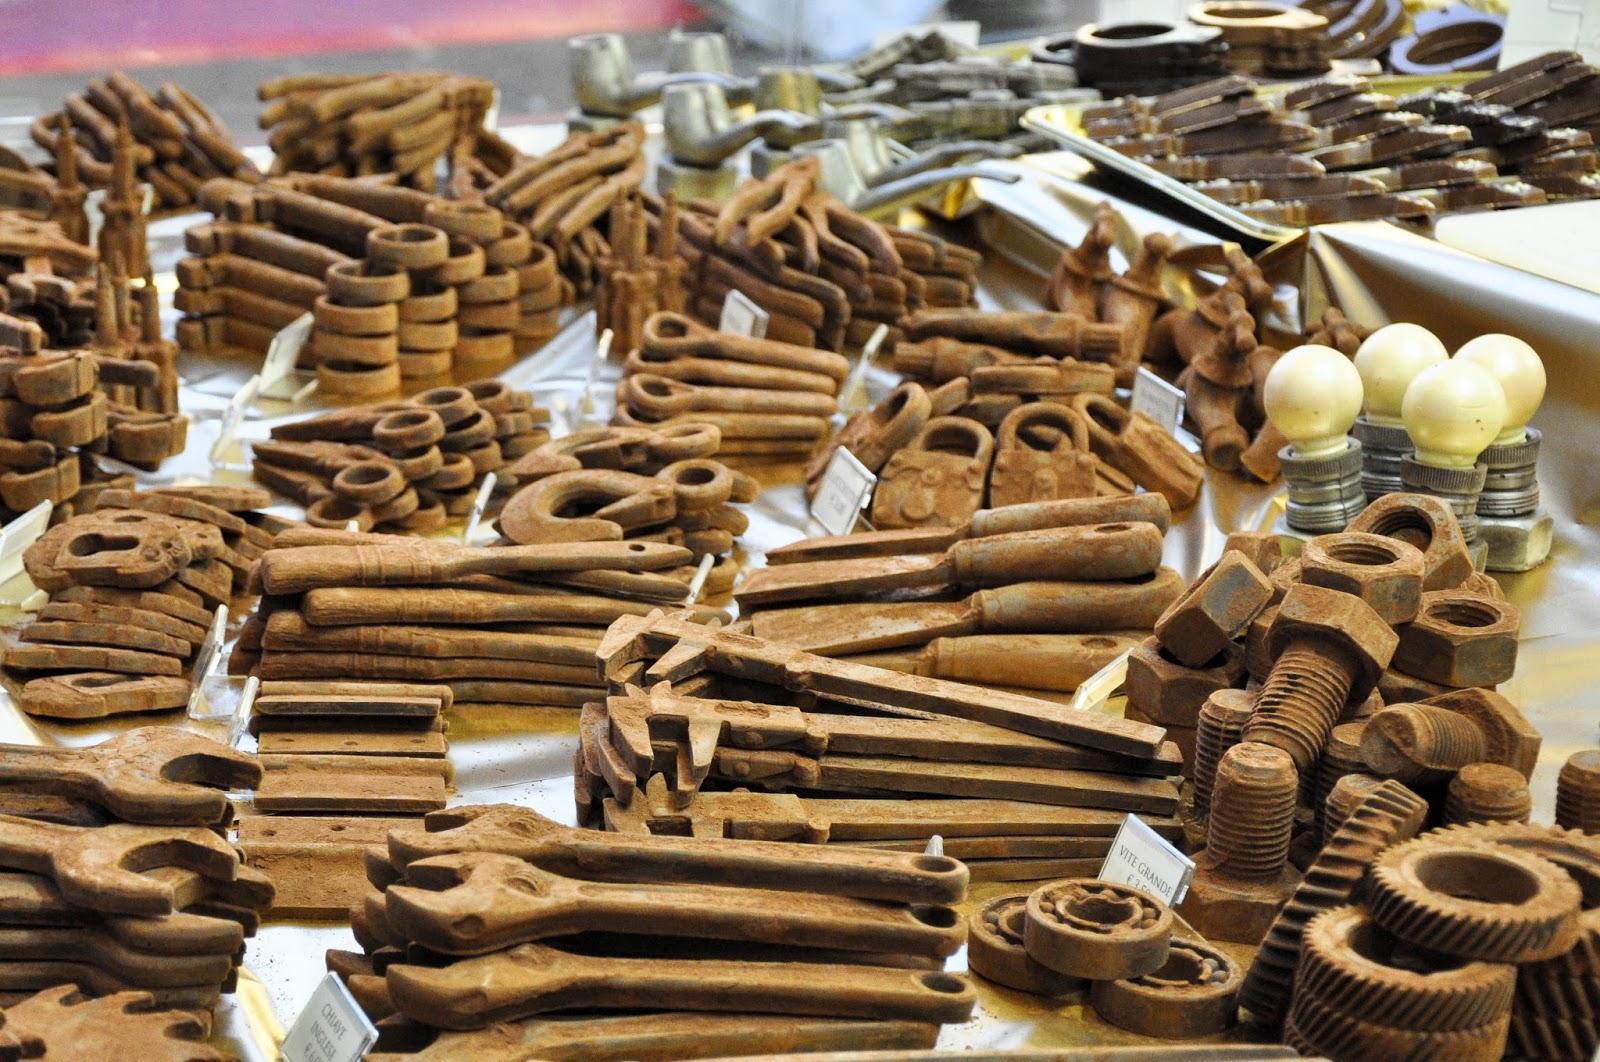 Tools made of chocolate, Chocolate Festival, Piazza dei Signori, Vicenza, Veneto, Italy